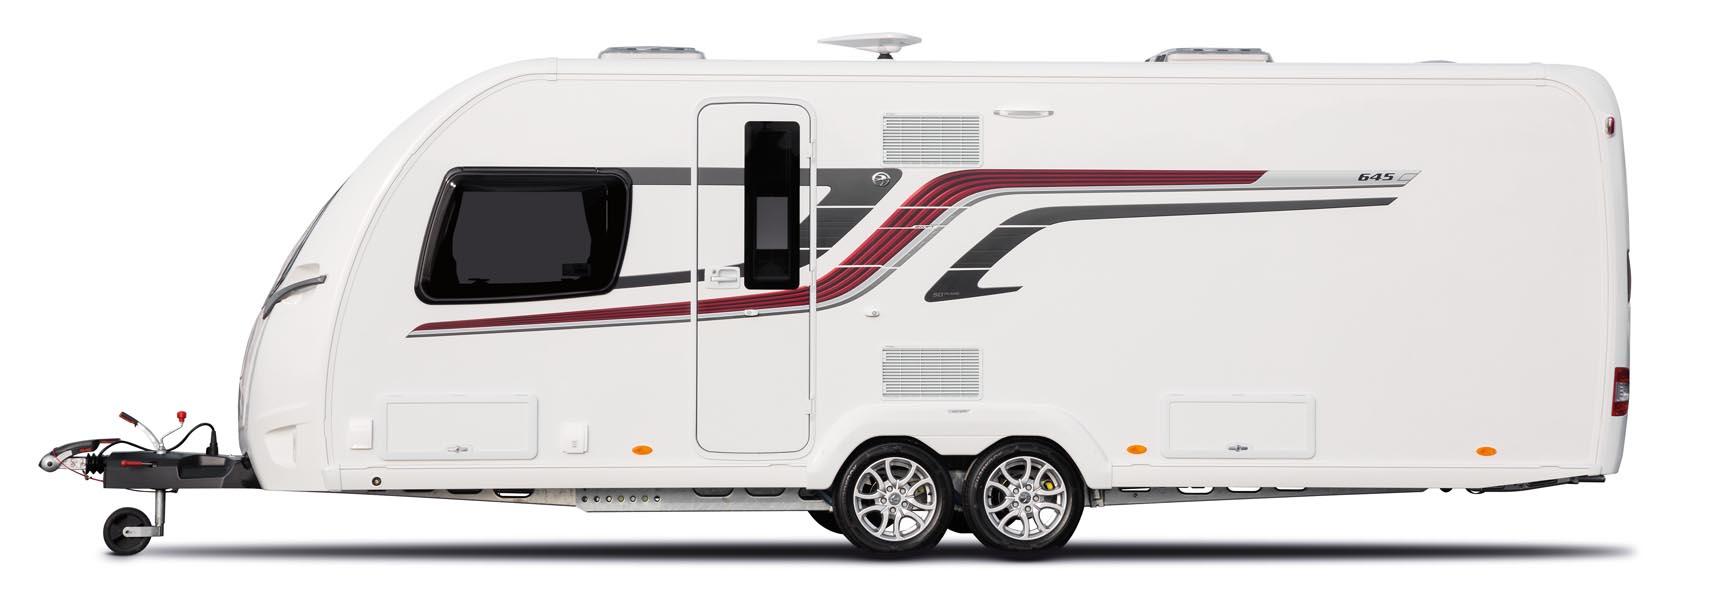 Awesome  New Make Swift Range Charisma Model 565 Type Caravan Year 2011 Weight